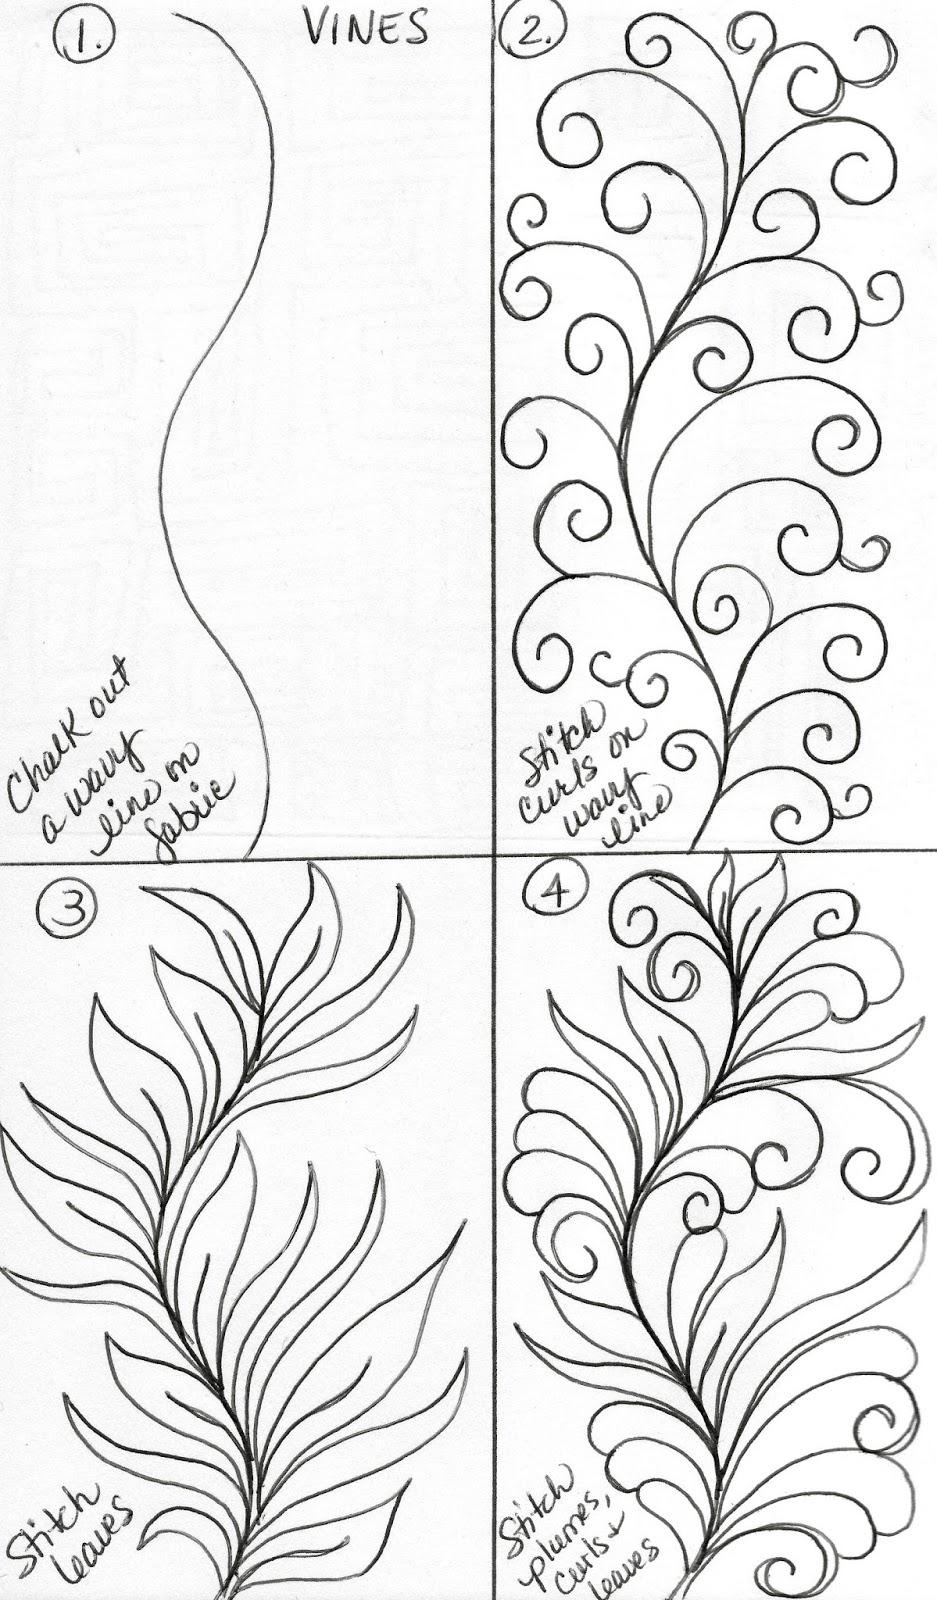 LuAnn Kessi: Sketch Book......Vine Designs